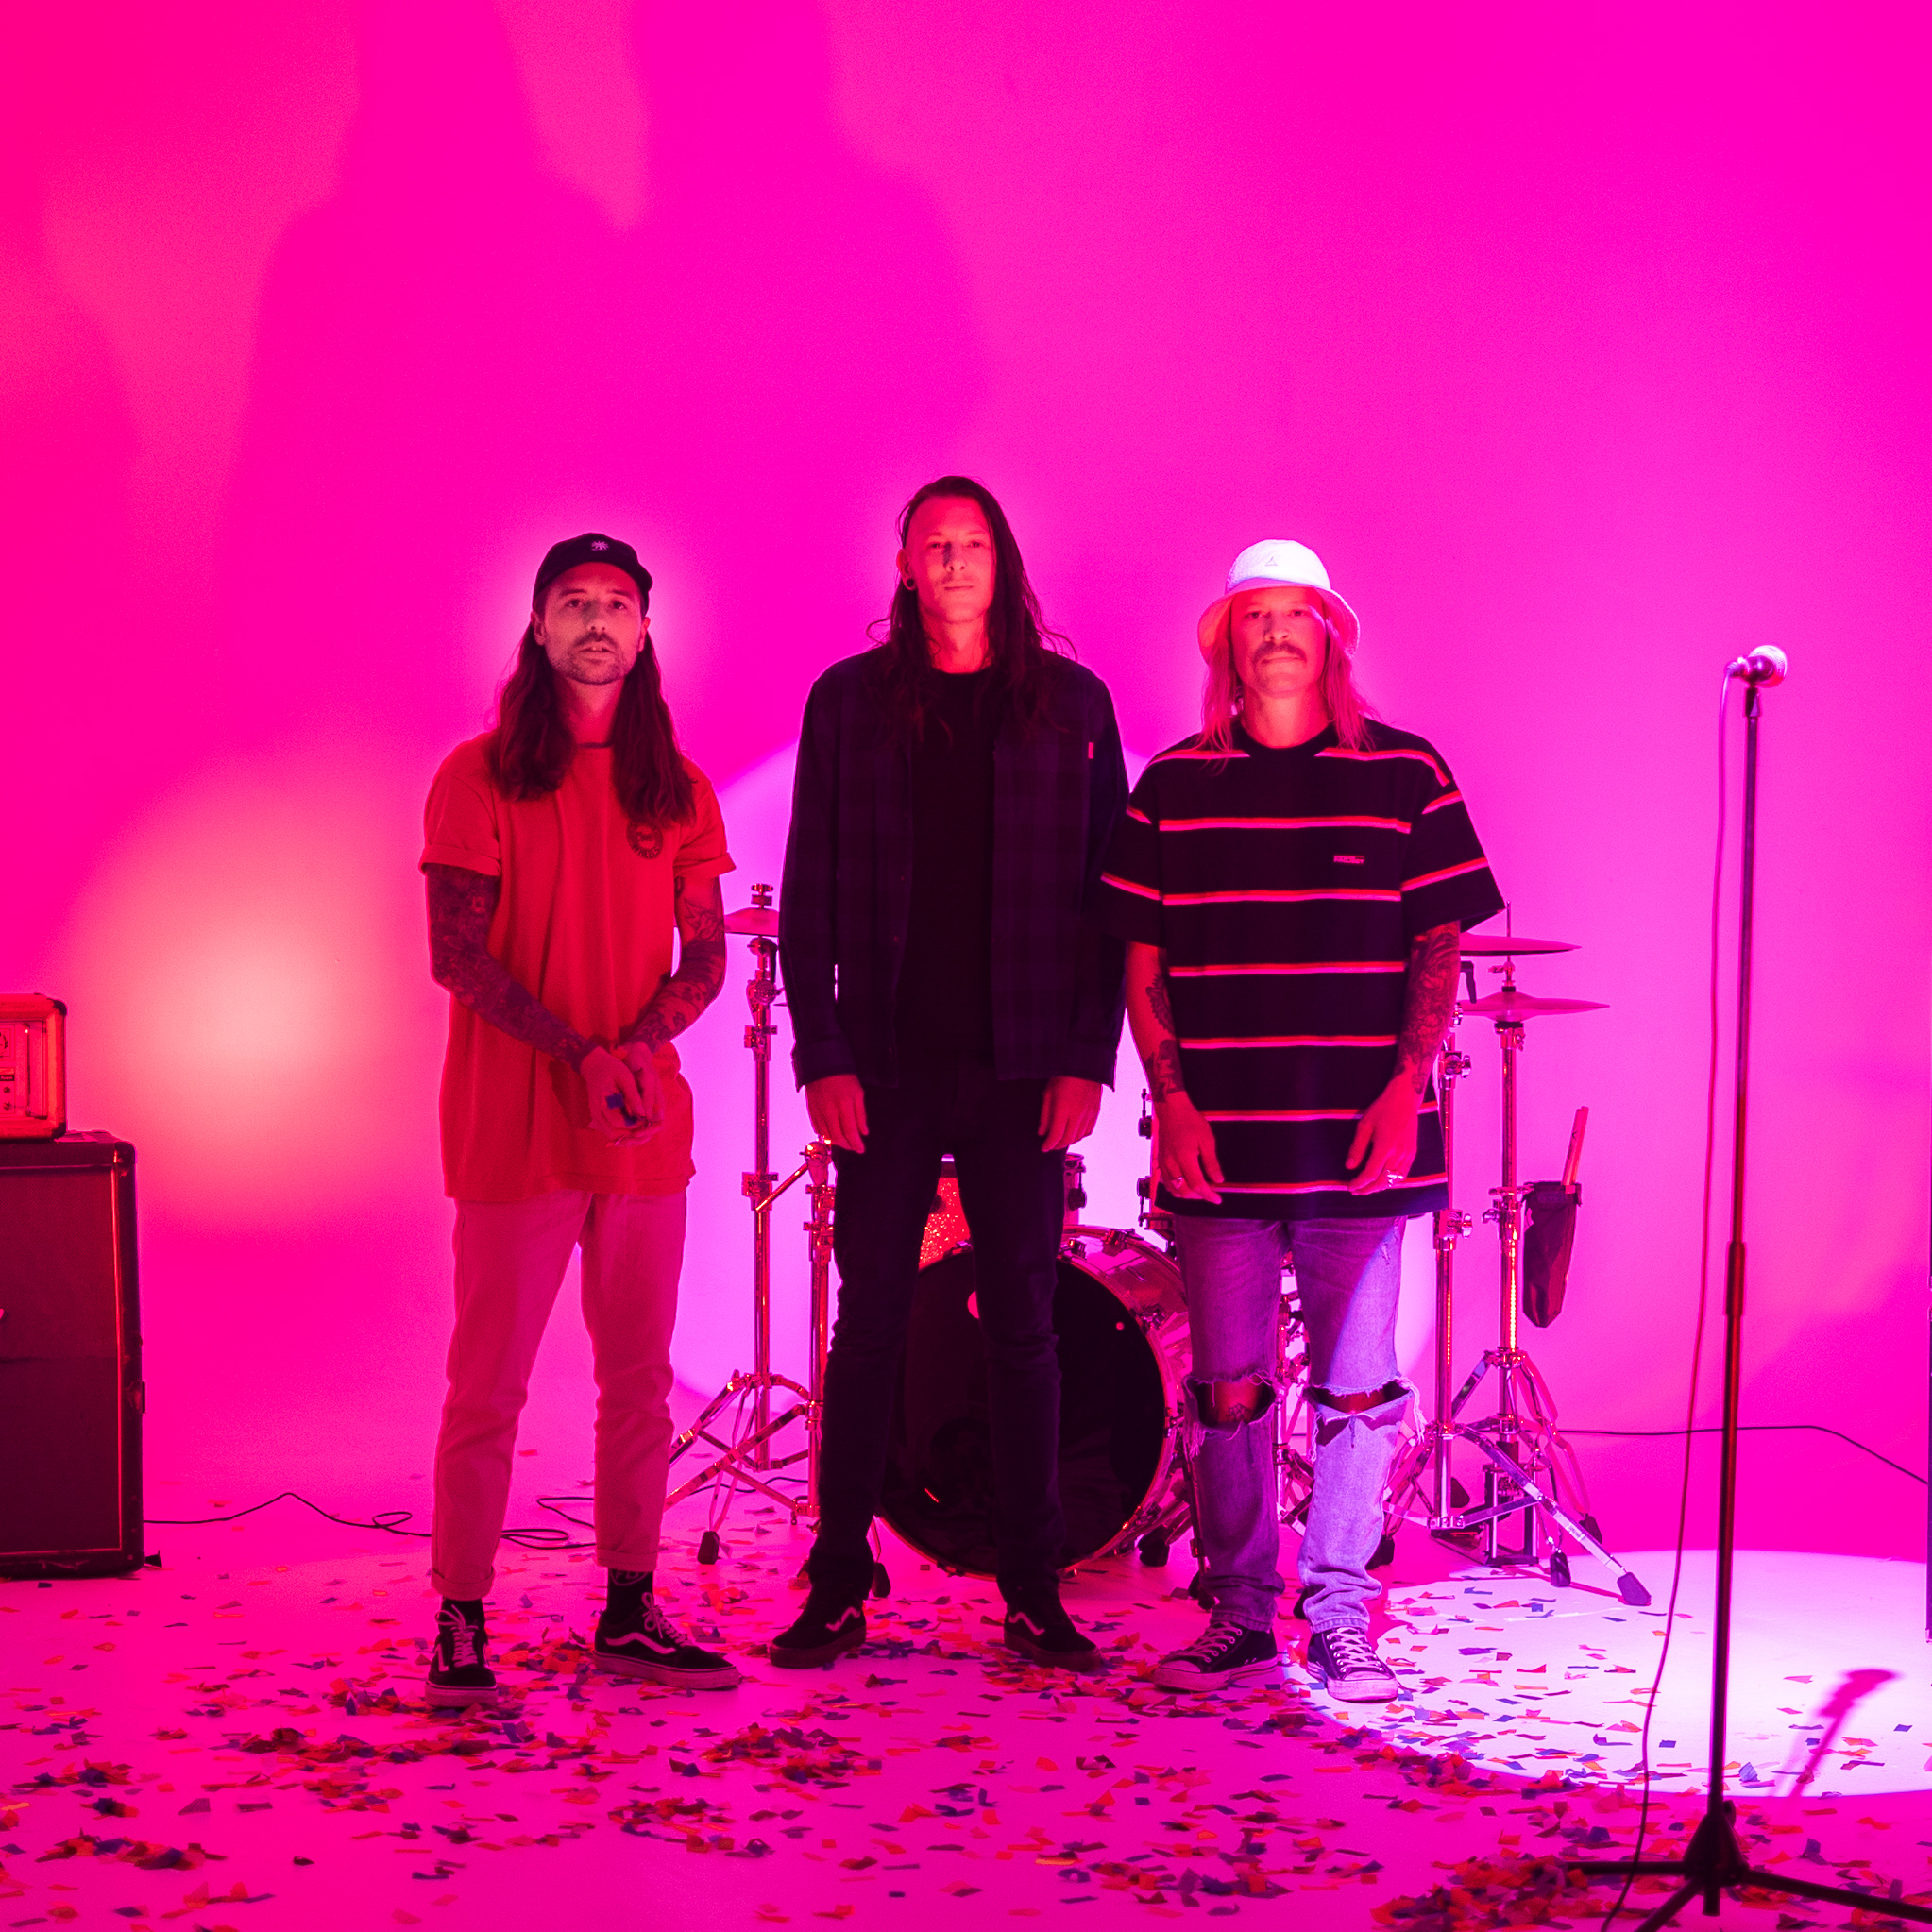 The Dead Love release new LP 'The Extinction of Unicorns'